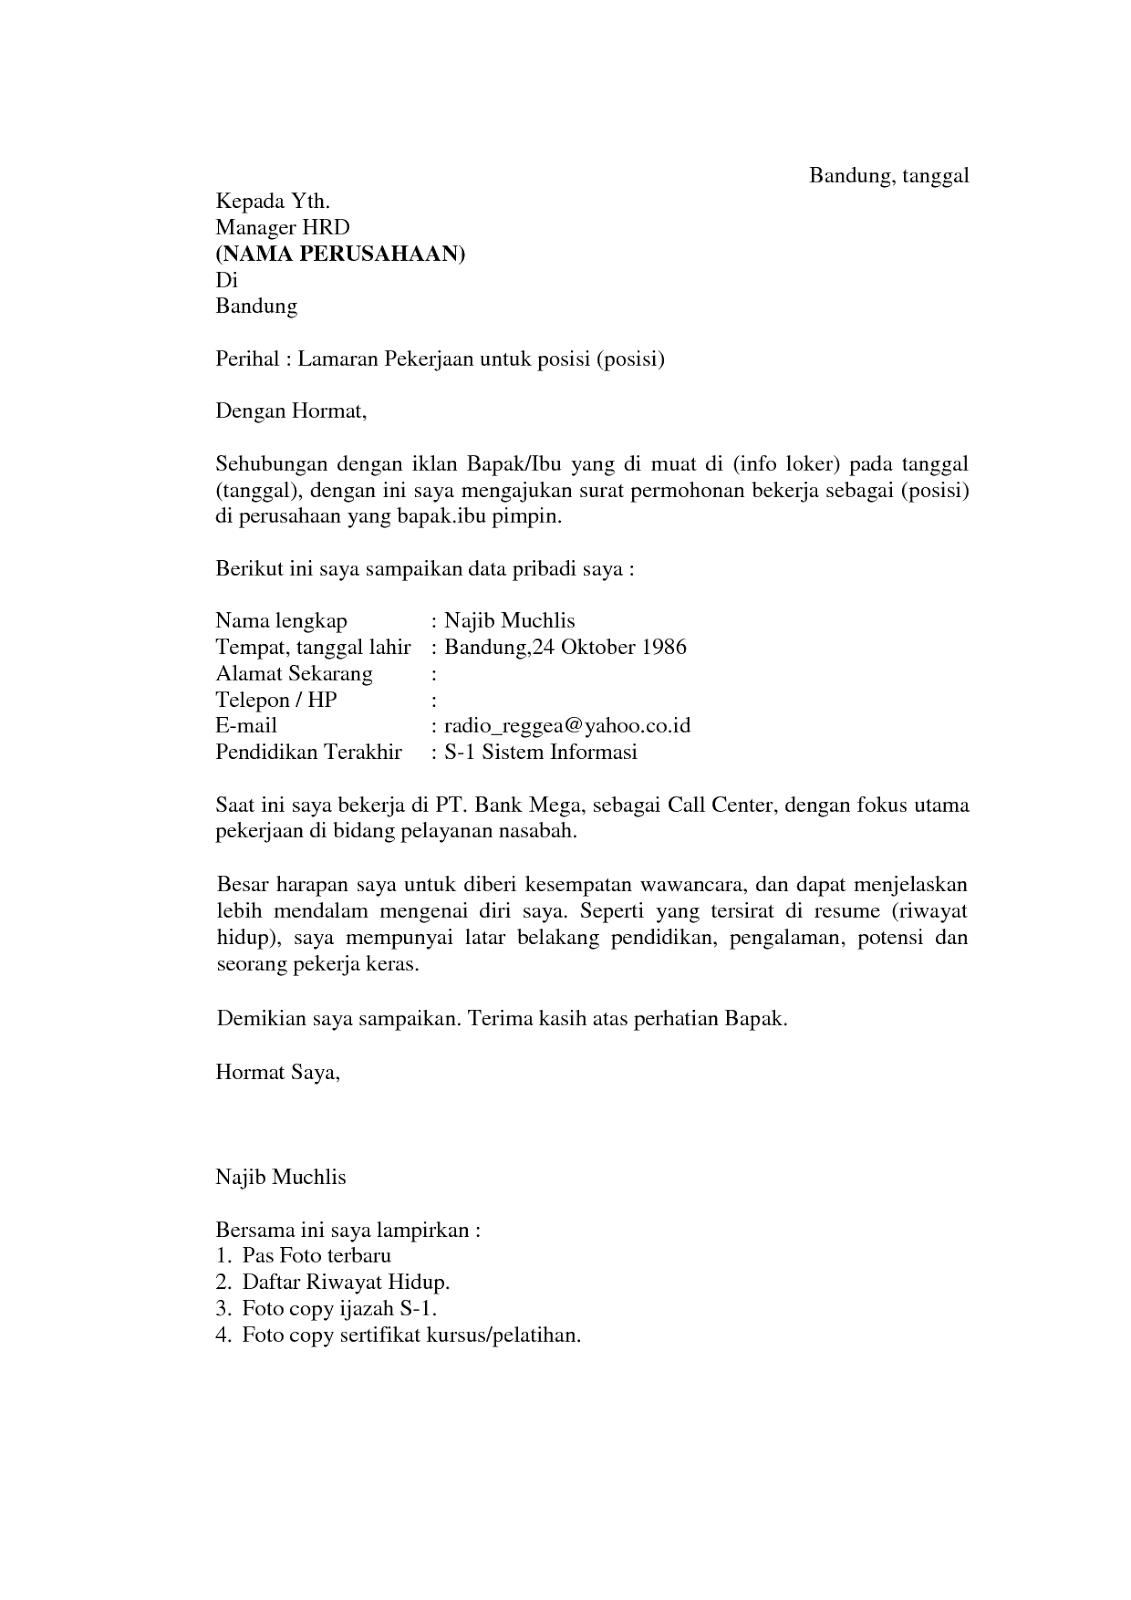 Contoh Surat Lamaran Kerja HRD - ben jobs